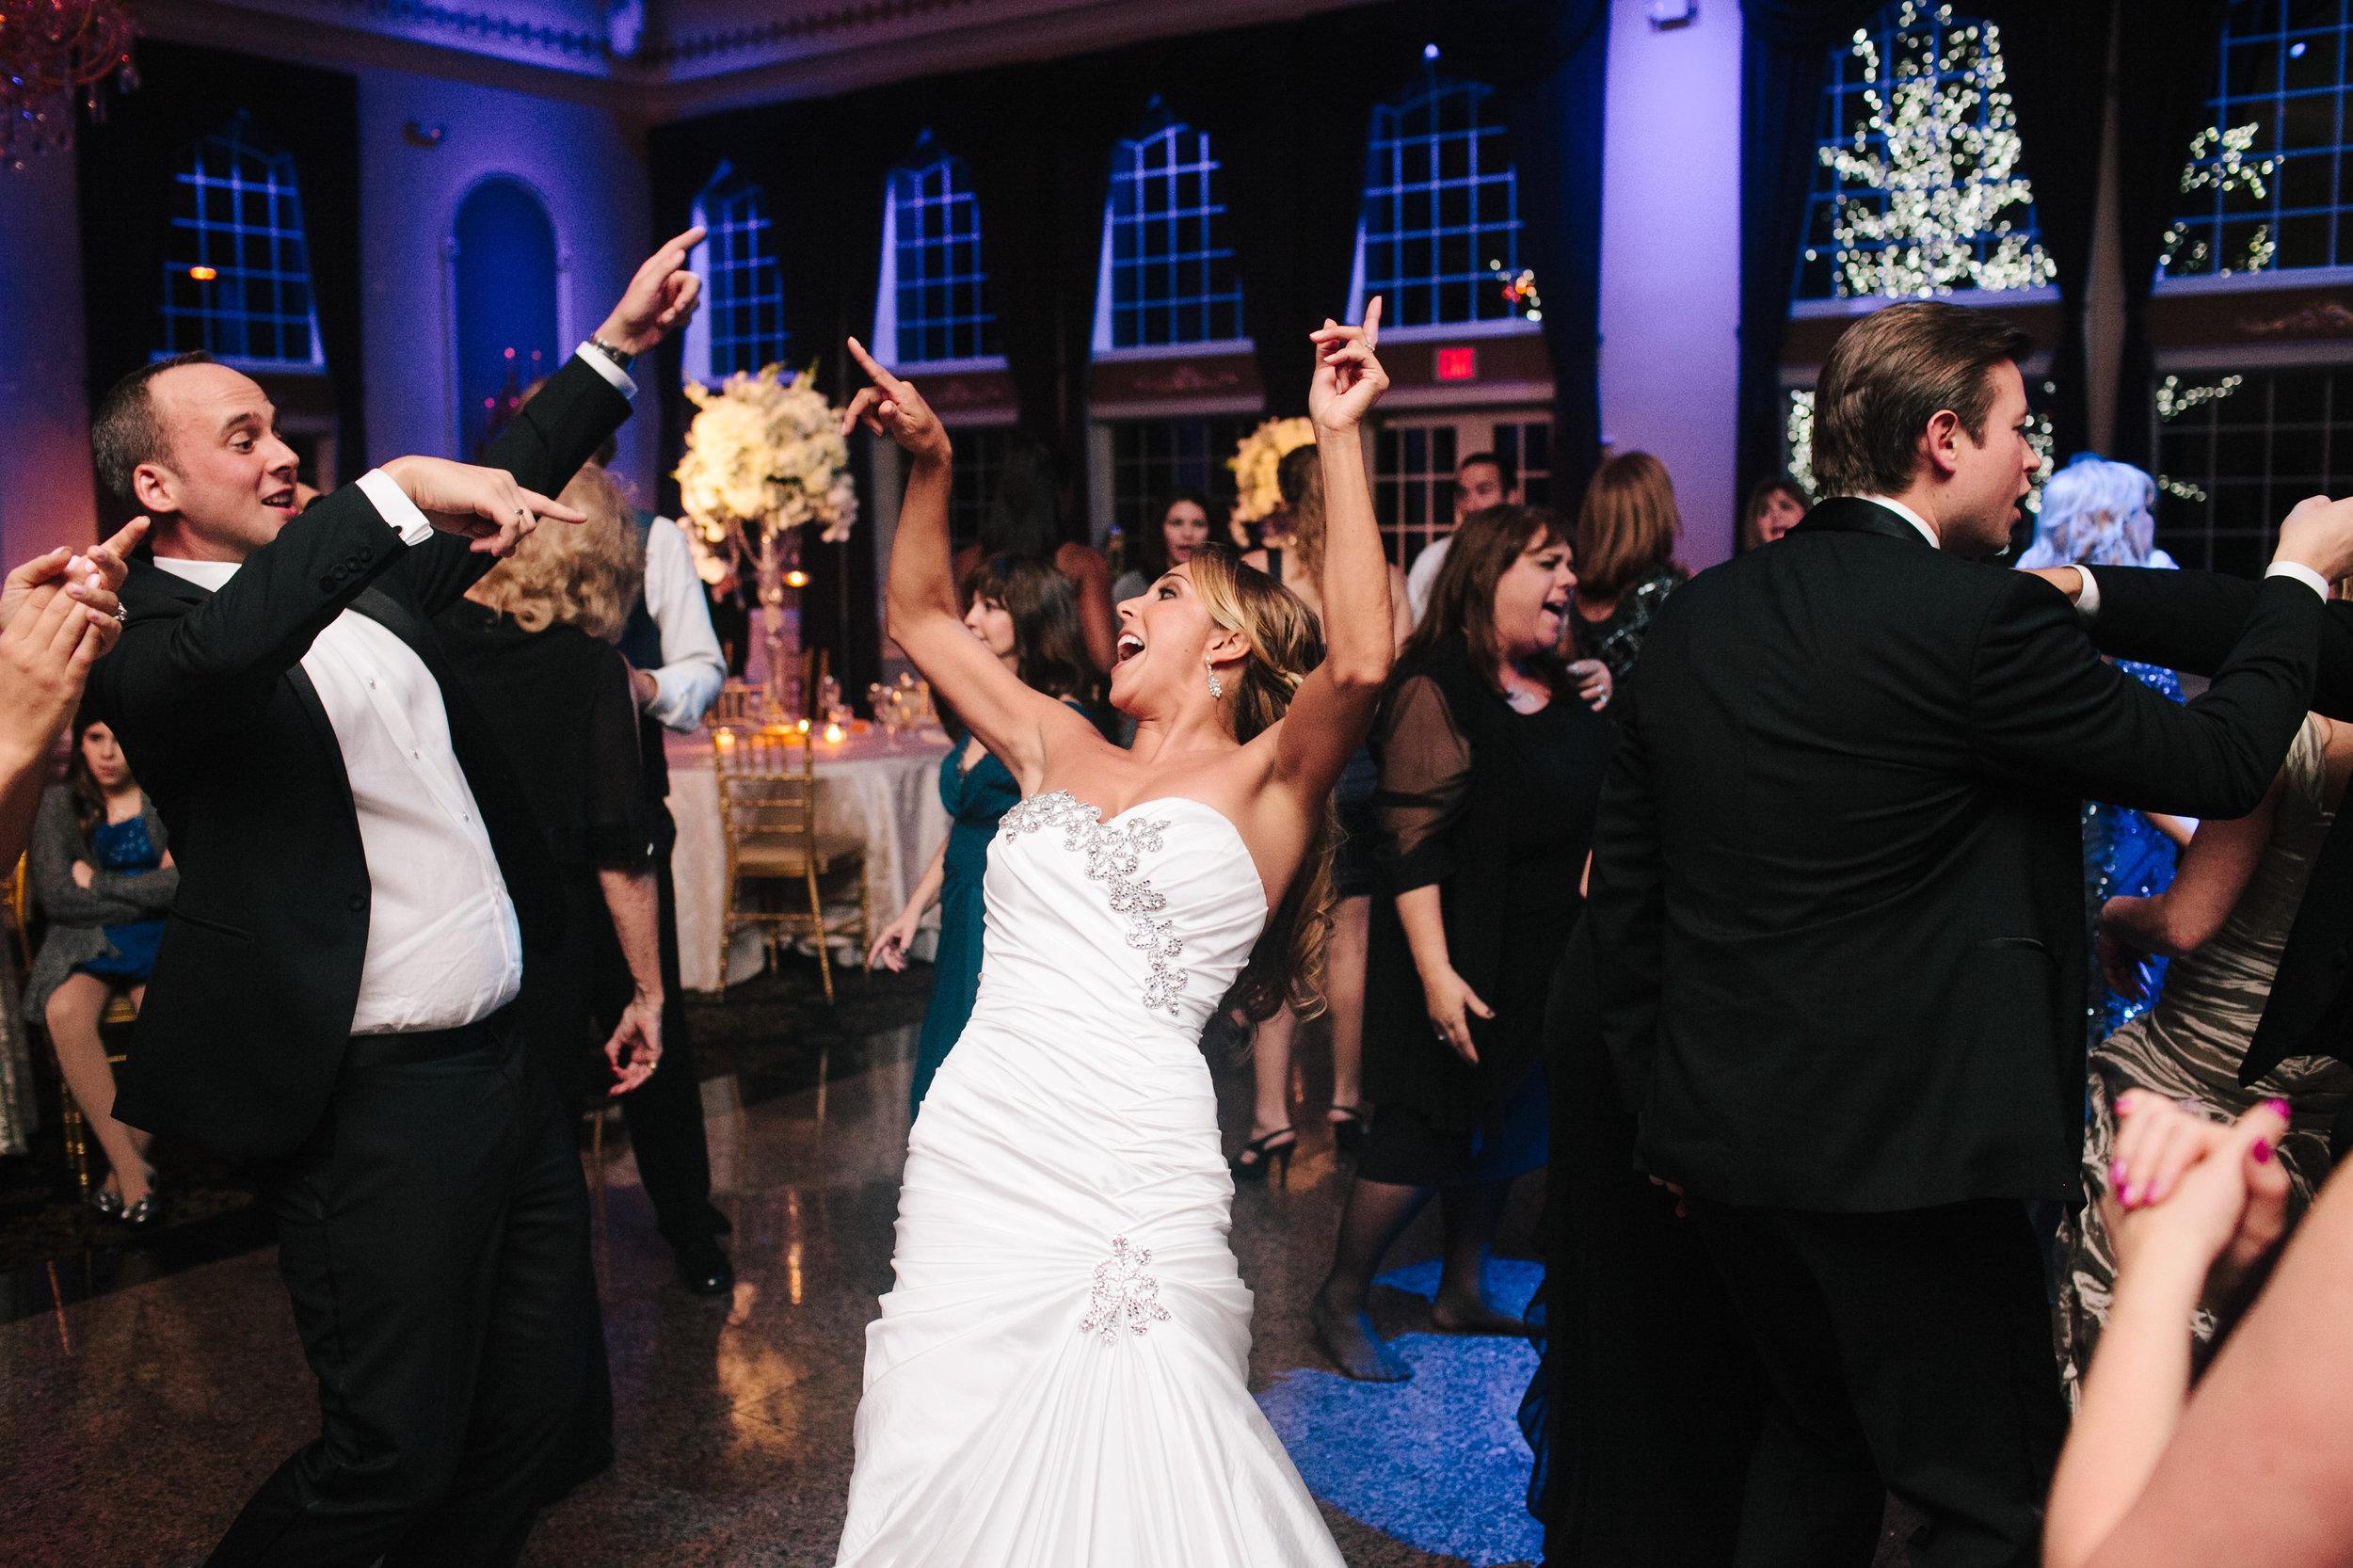 Ceci_New_York_Custom_Invitation_ New_Jersey_Wedding_Luxury_Personalized_Ceci_Style_Bride_Foil_Stamping179.JPG